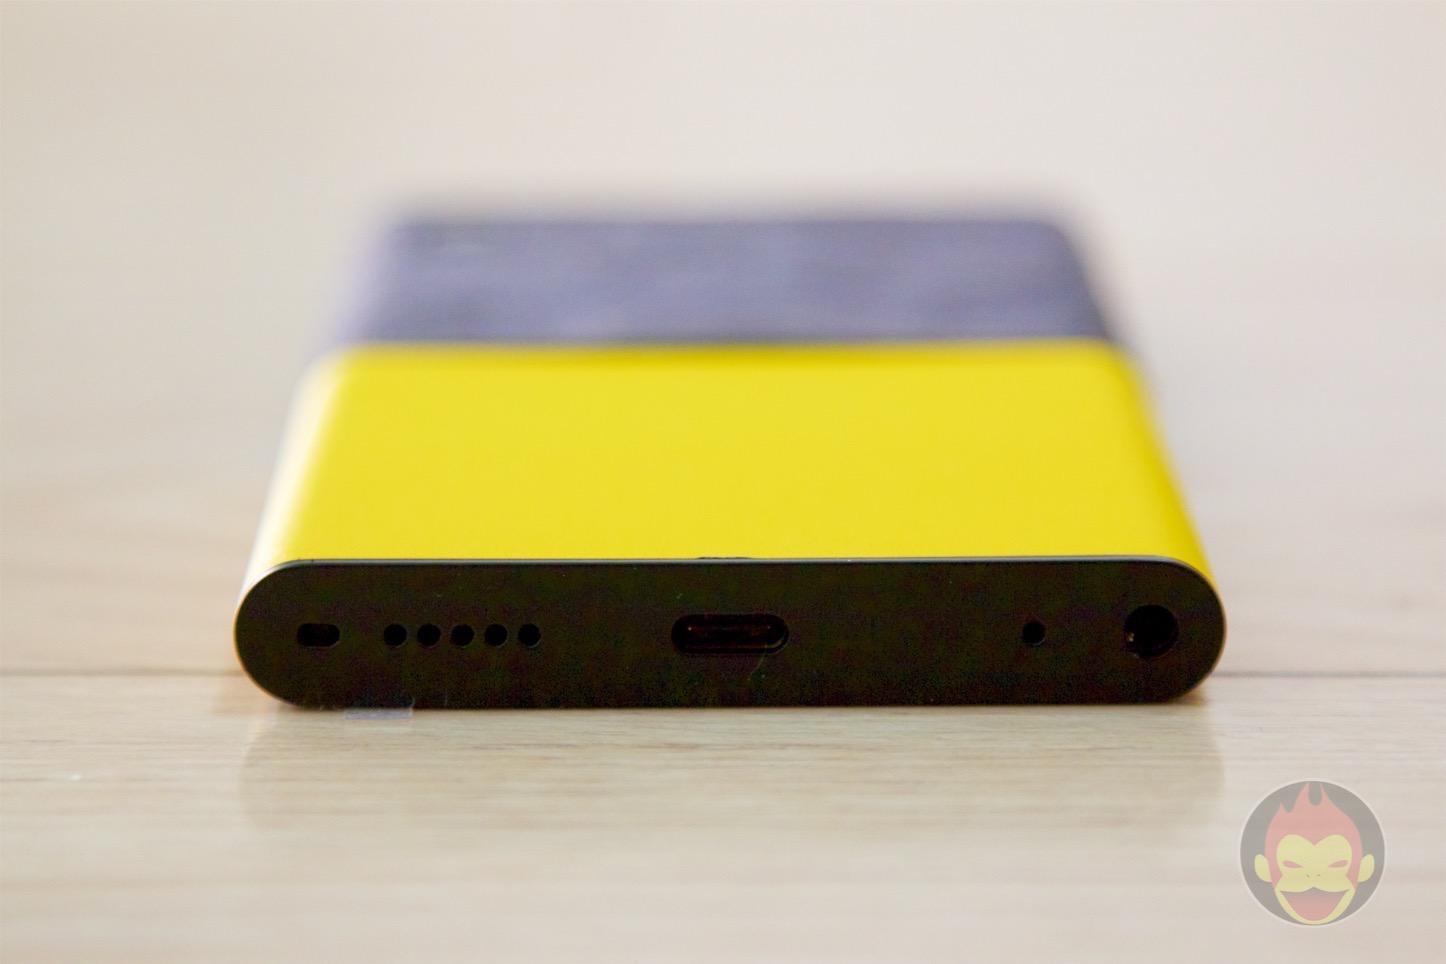 NuAns-Neo-Windows-10-Smartphone-10.jpg